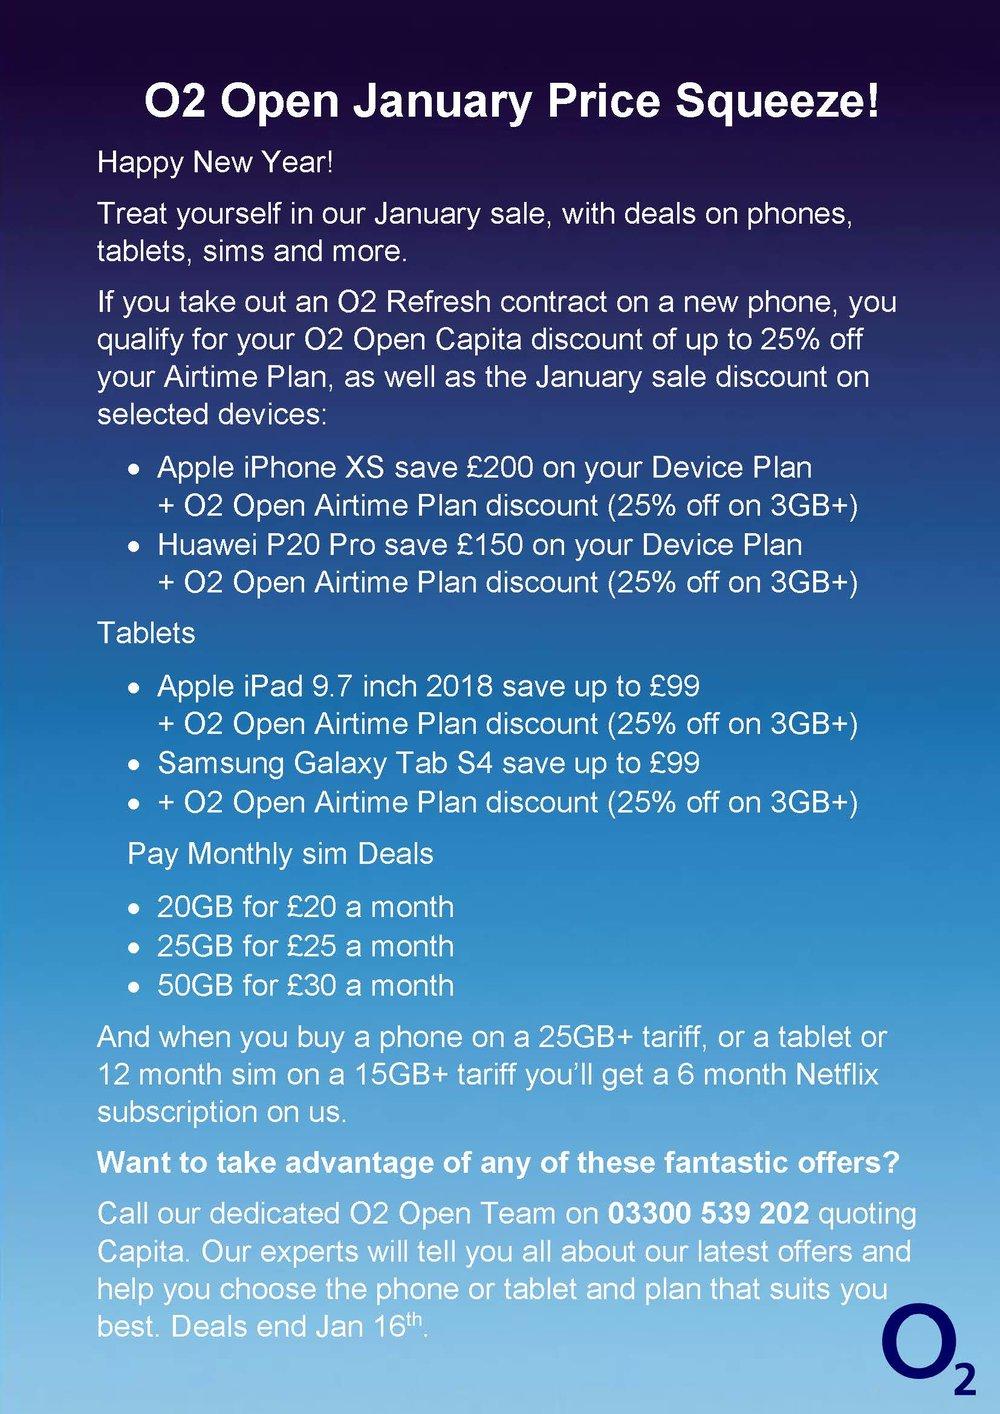 O2 Open - Capita January Price Squeeze.jpg